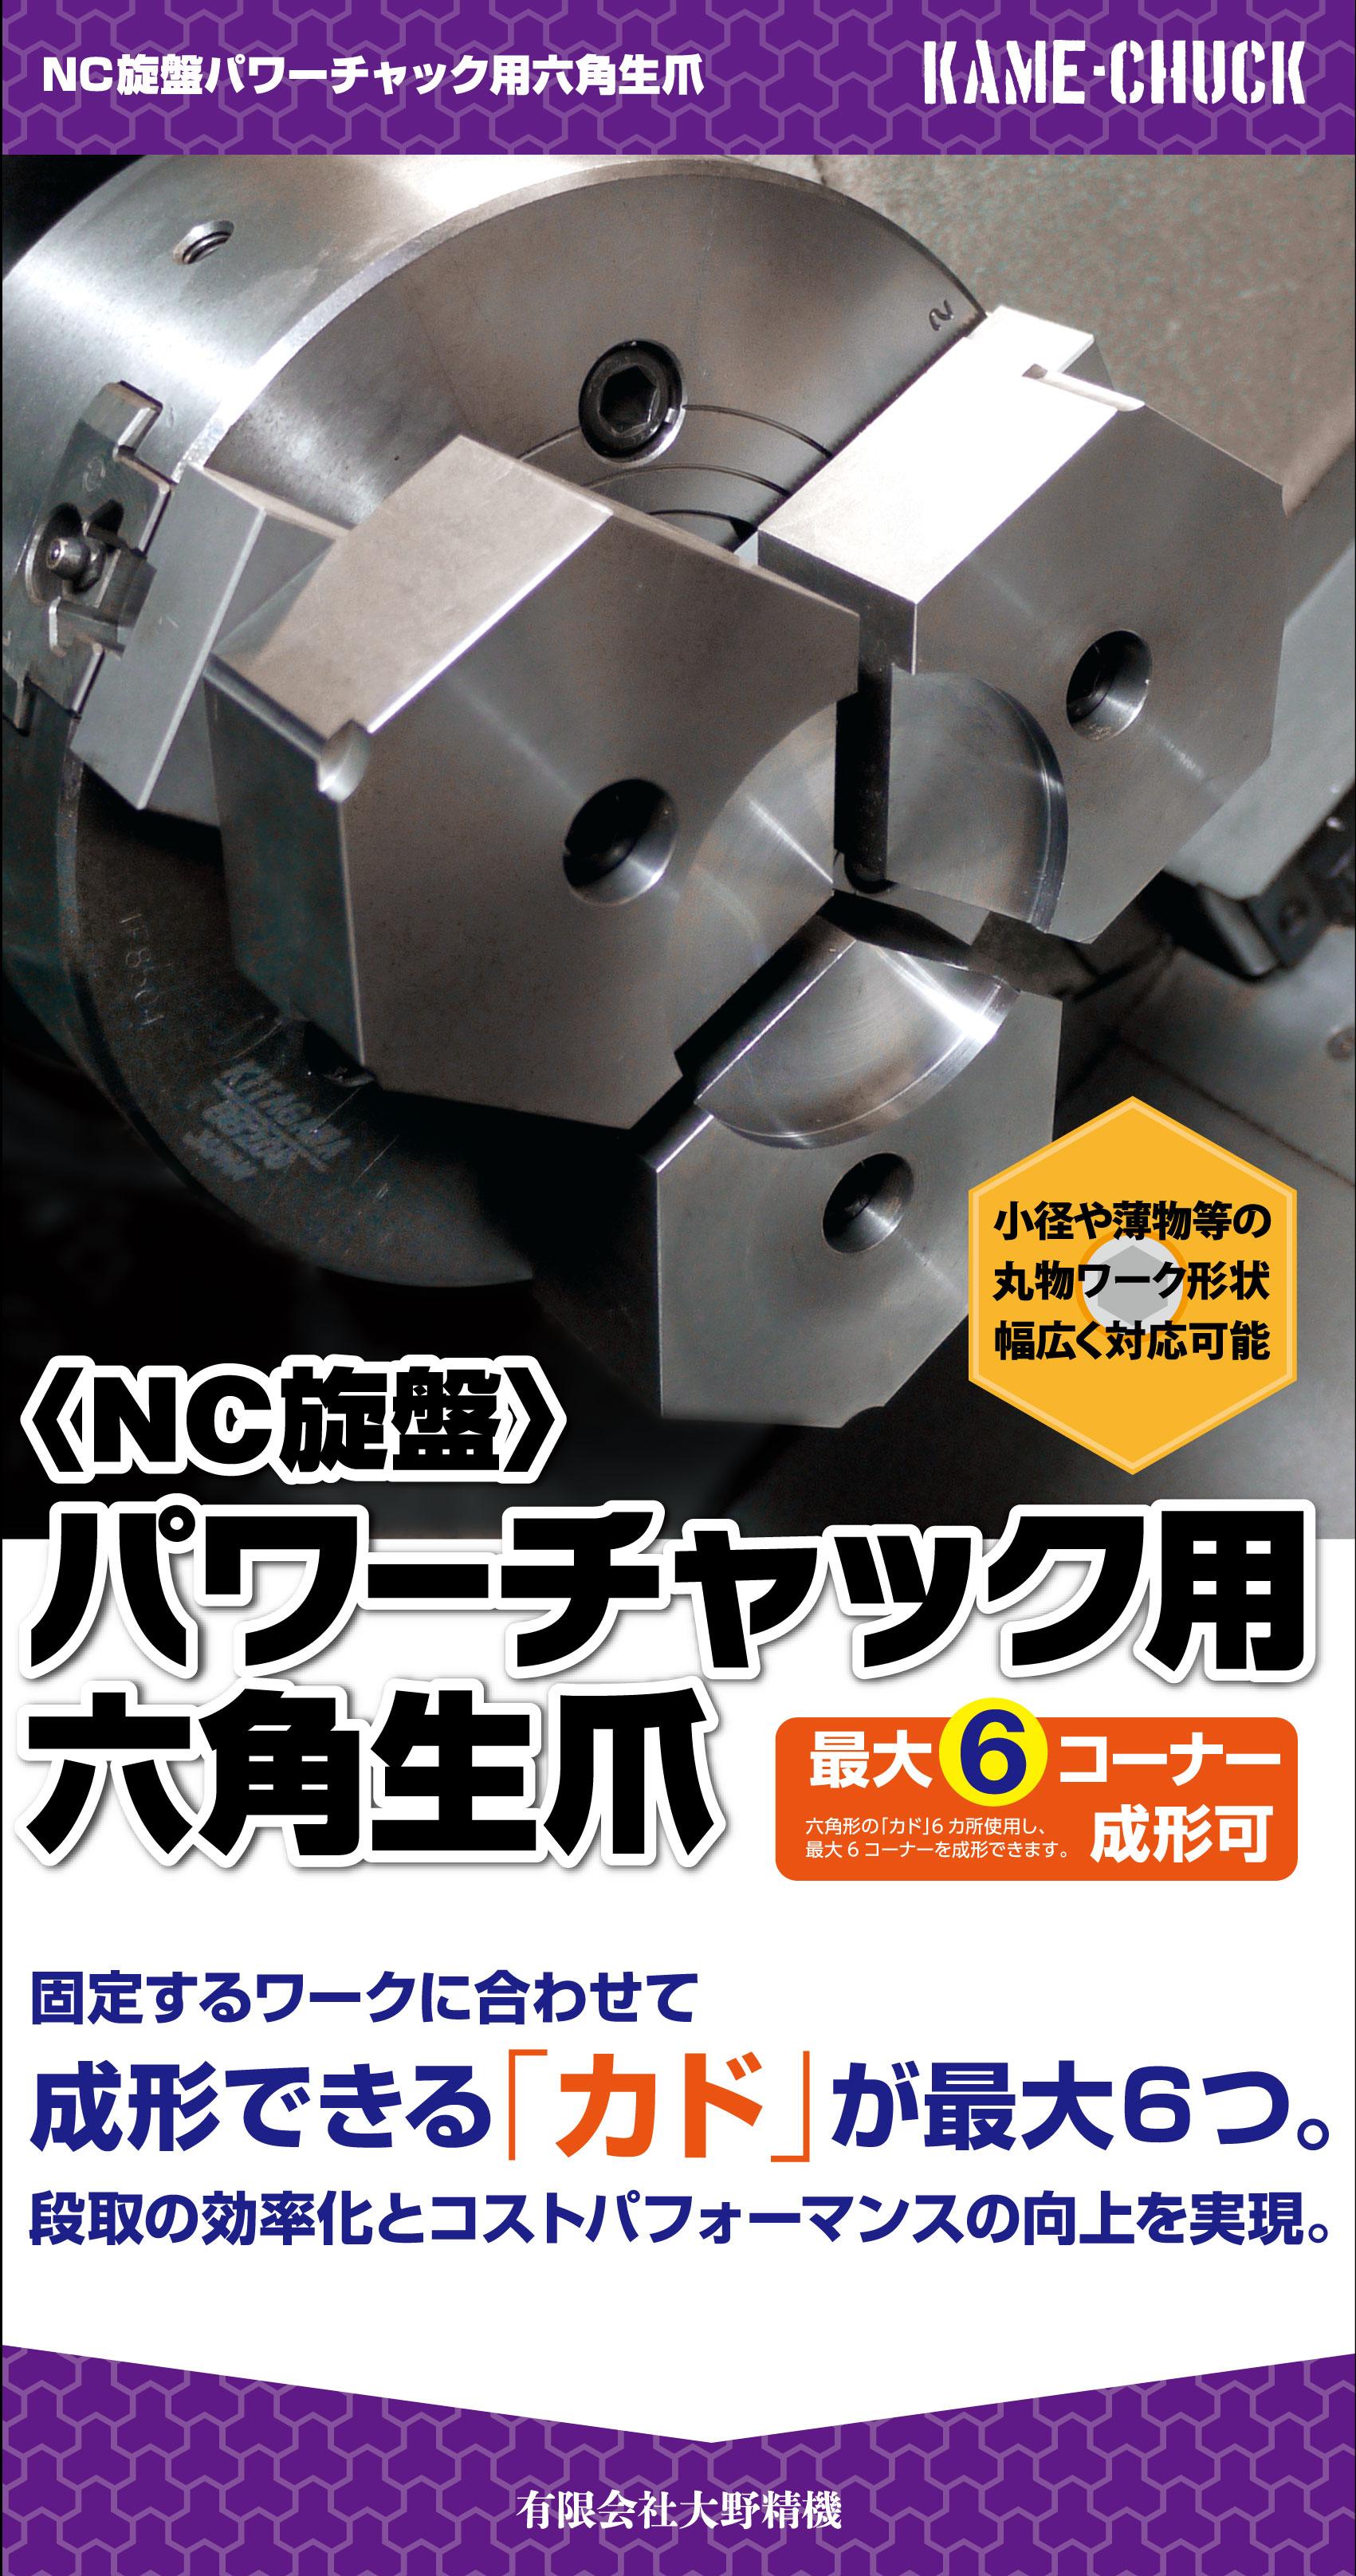 NC旋盤パワーチャック用六角生爪ー固定するワークに合わせて成形できる「カド」が最大6つ